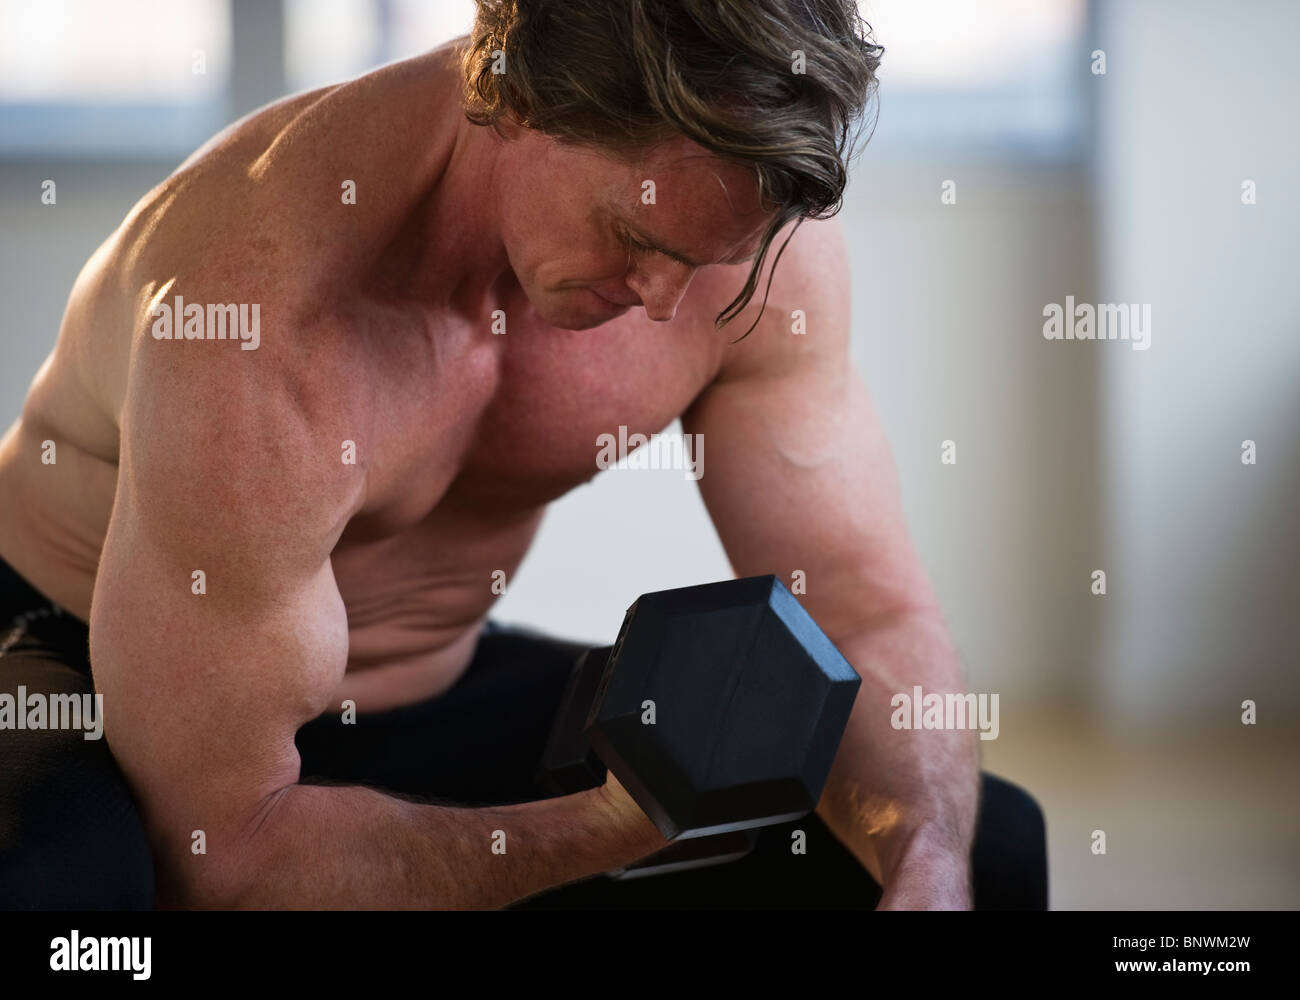 Muscular man lifting free weight - Stock Image